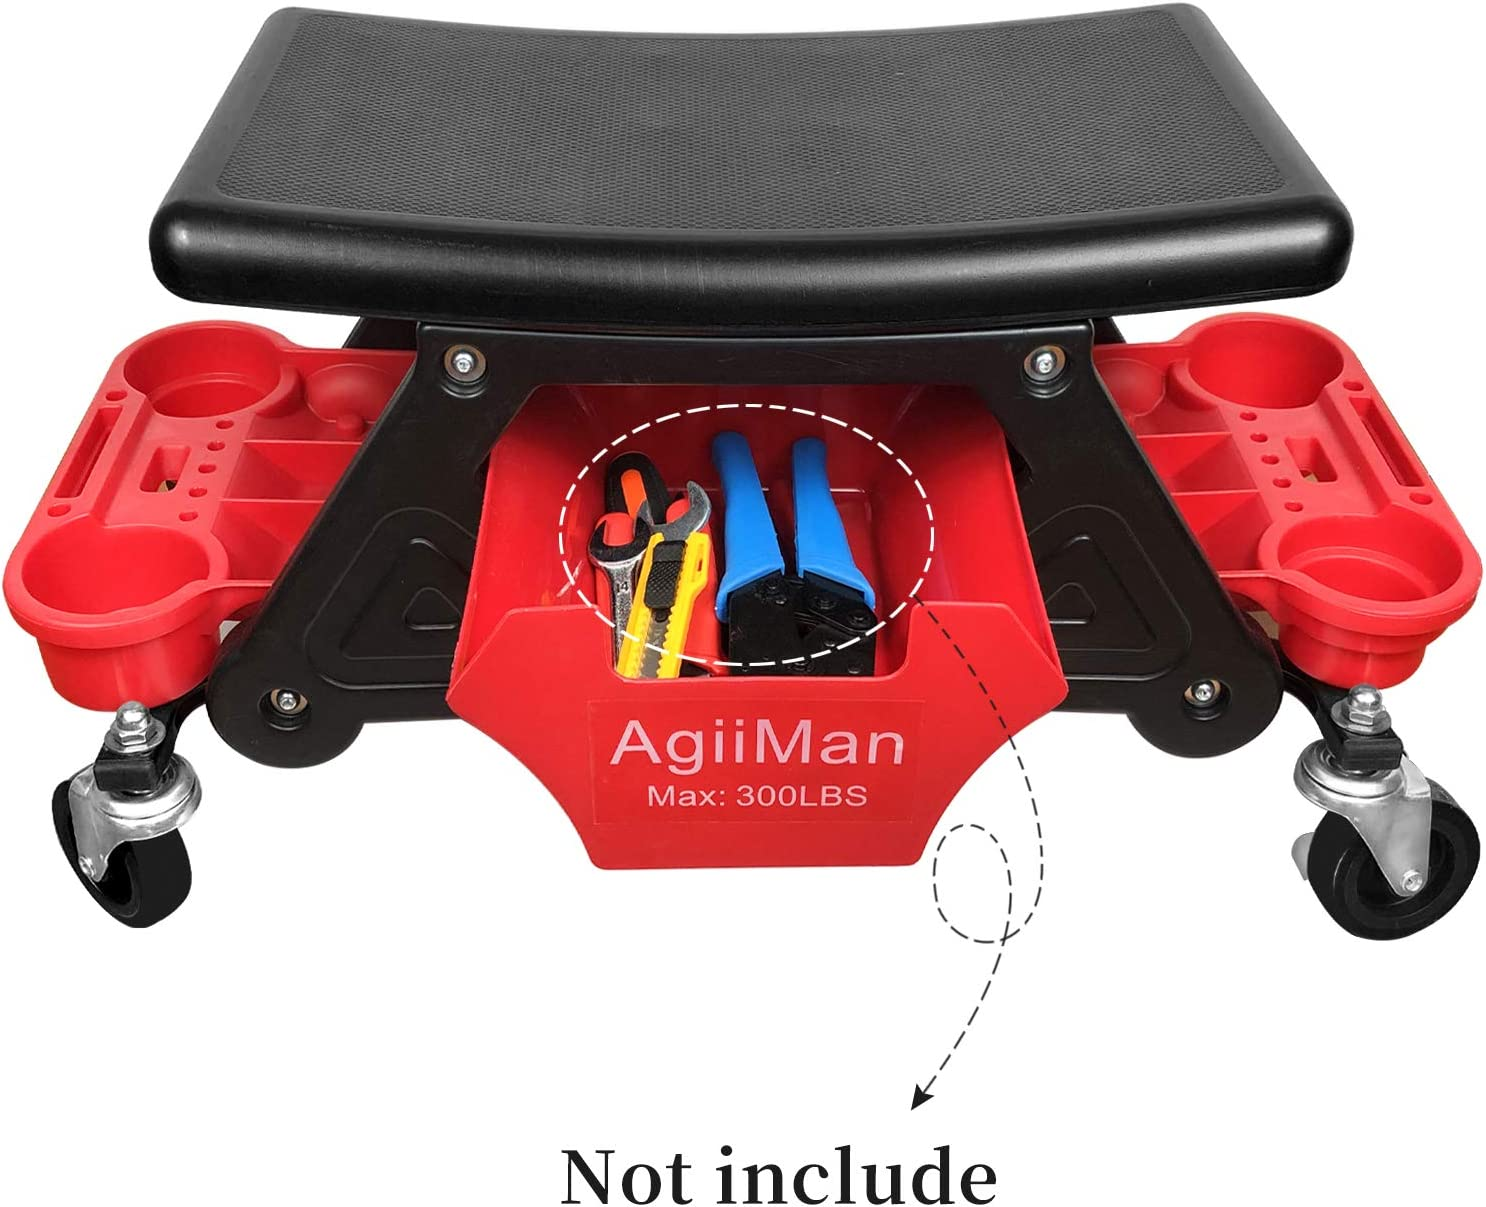 AgiiMan Garage Roller Stool Rolling Mechanic Stool Chair Repair Tools Tray Creeper Detailing Seat 300 Lbs Capacity 2 Tool Storage Drawers Under Seat